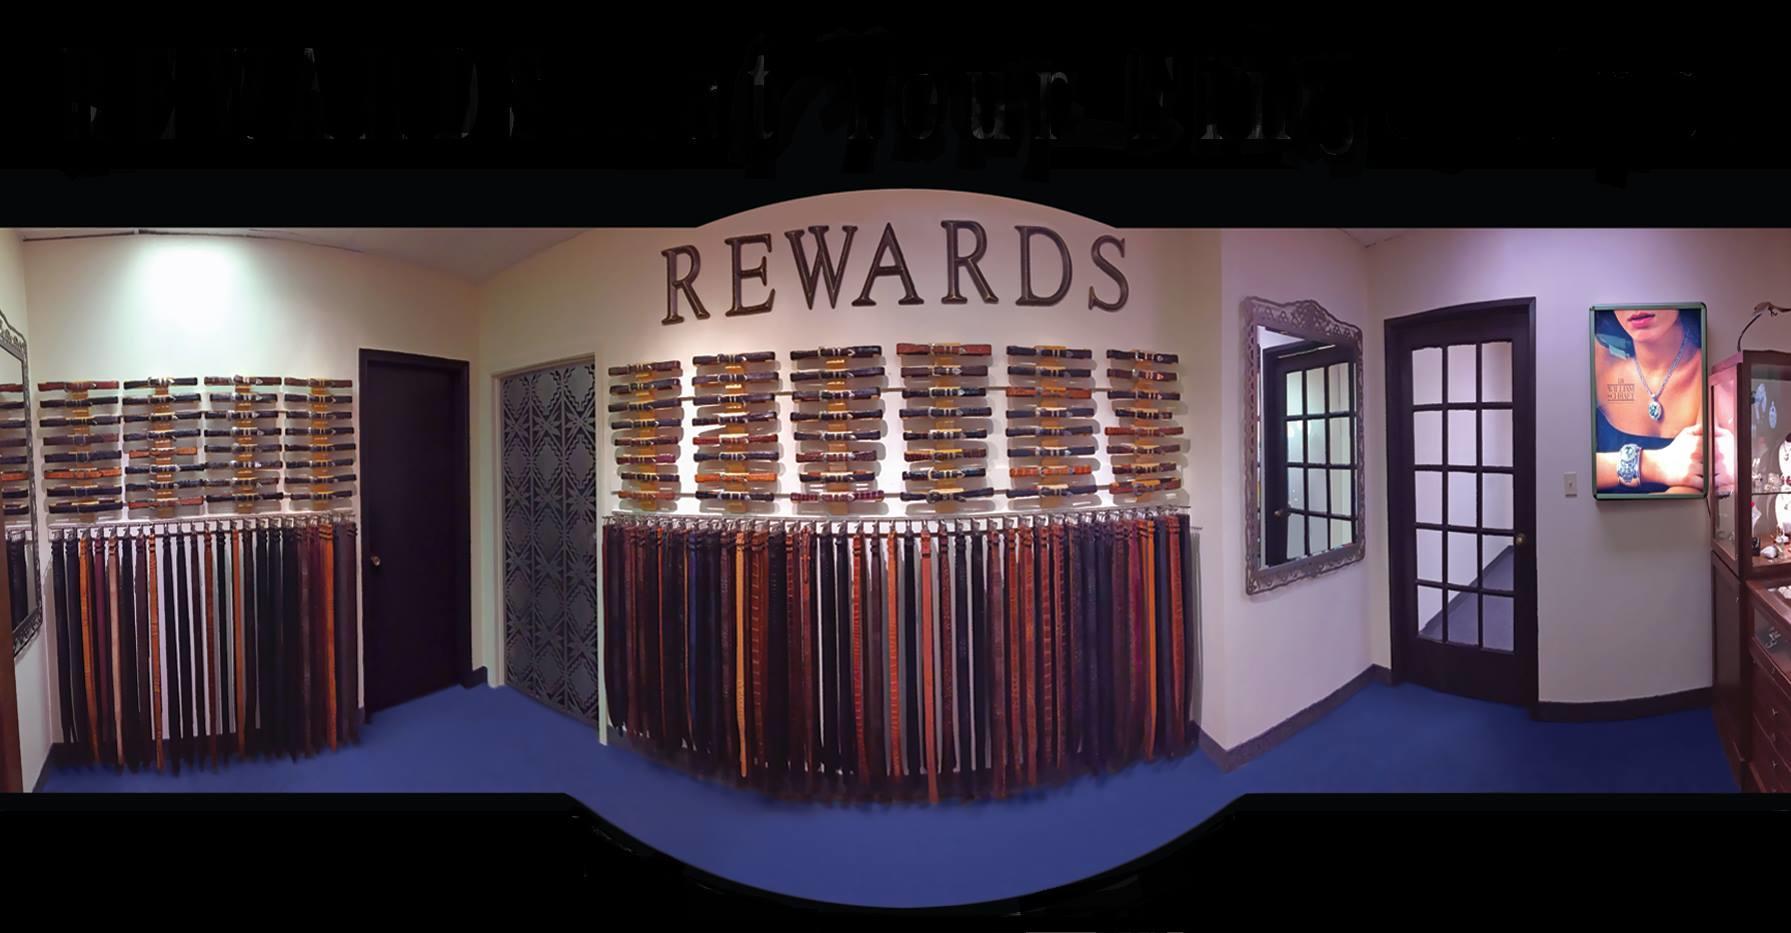 REWARDS image 1